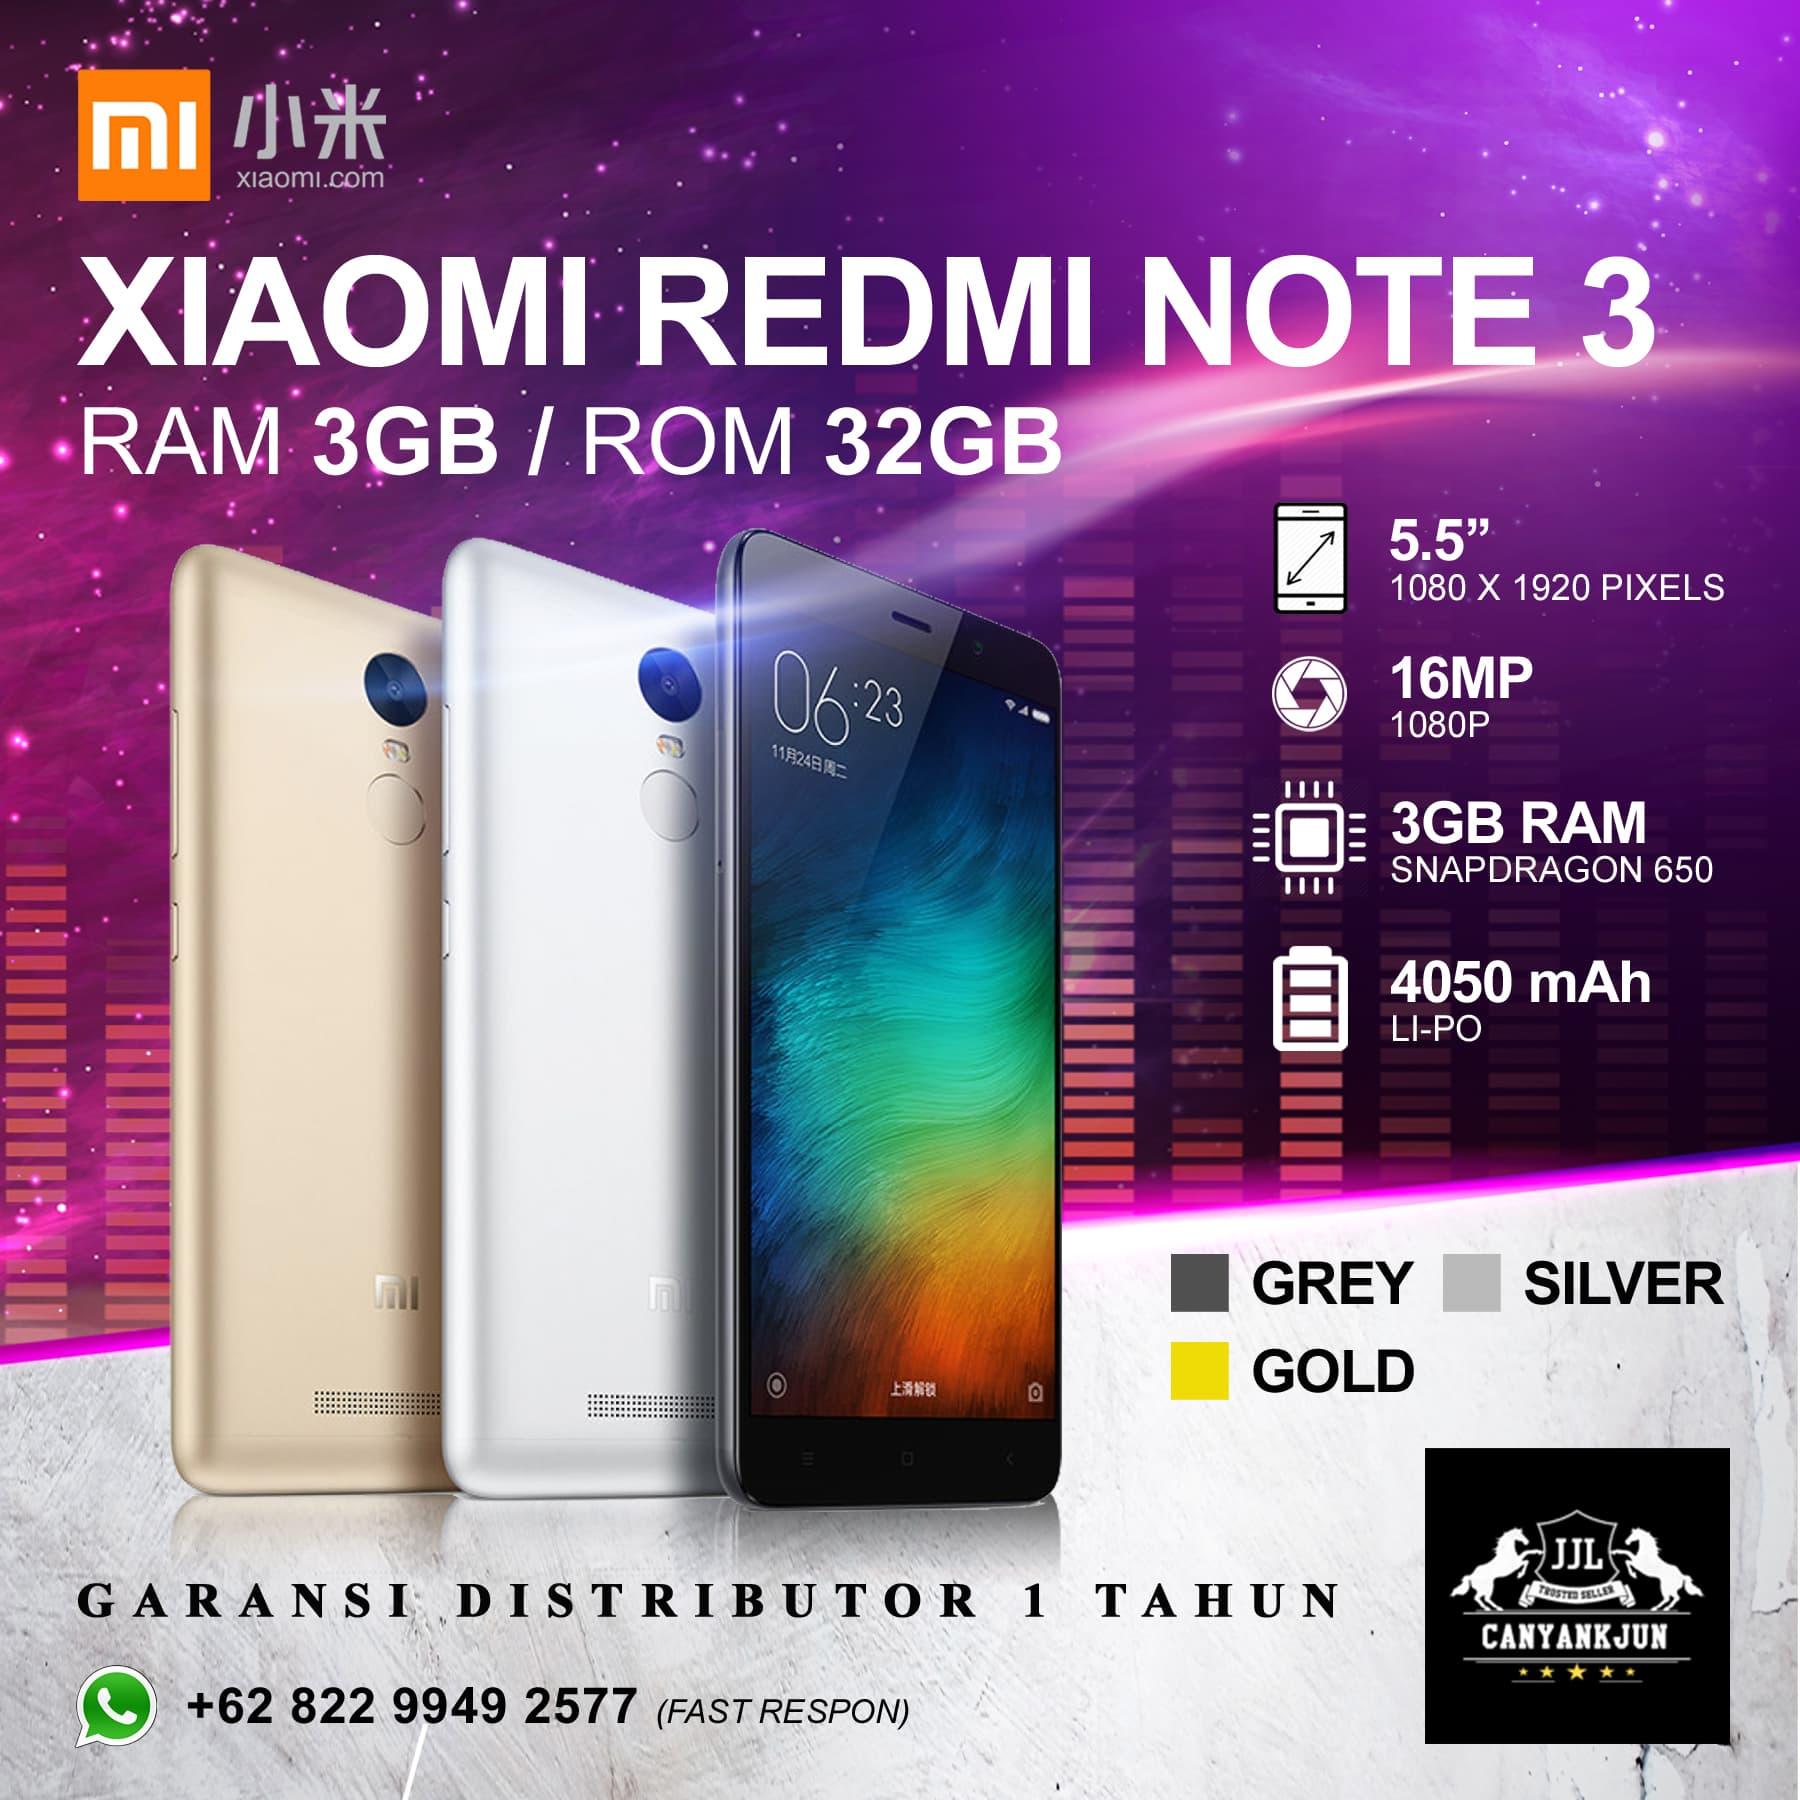 Jual Xiaomi Redmi Note 3 Ram Gb Garansi Distributor 1 Tahun S2 Gold 3gb 32gb 32 Brand New In Box Canyankjun Tokopedia